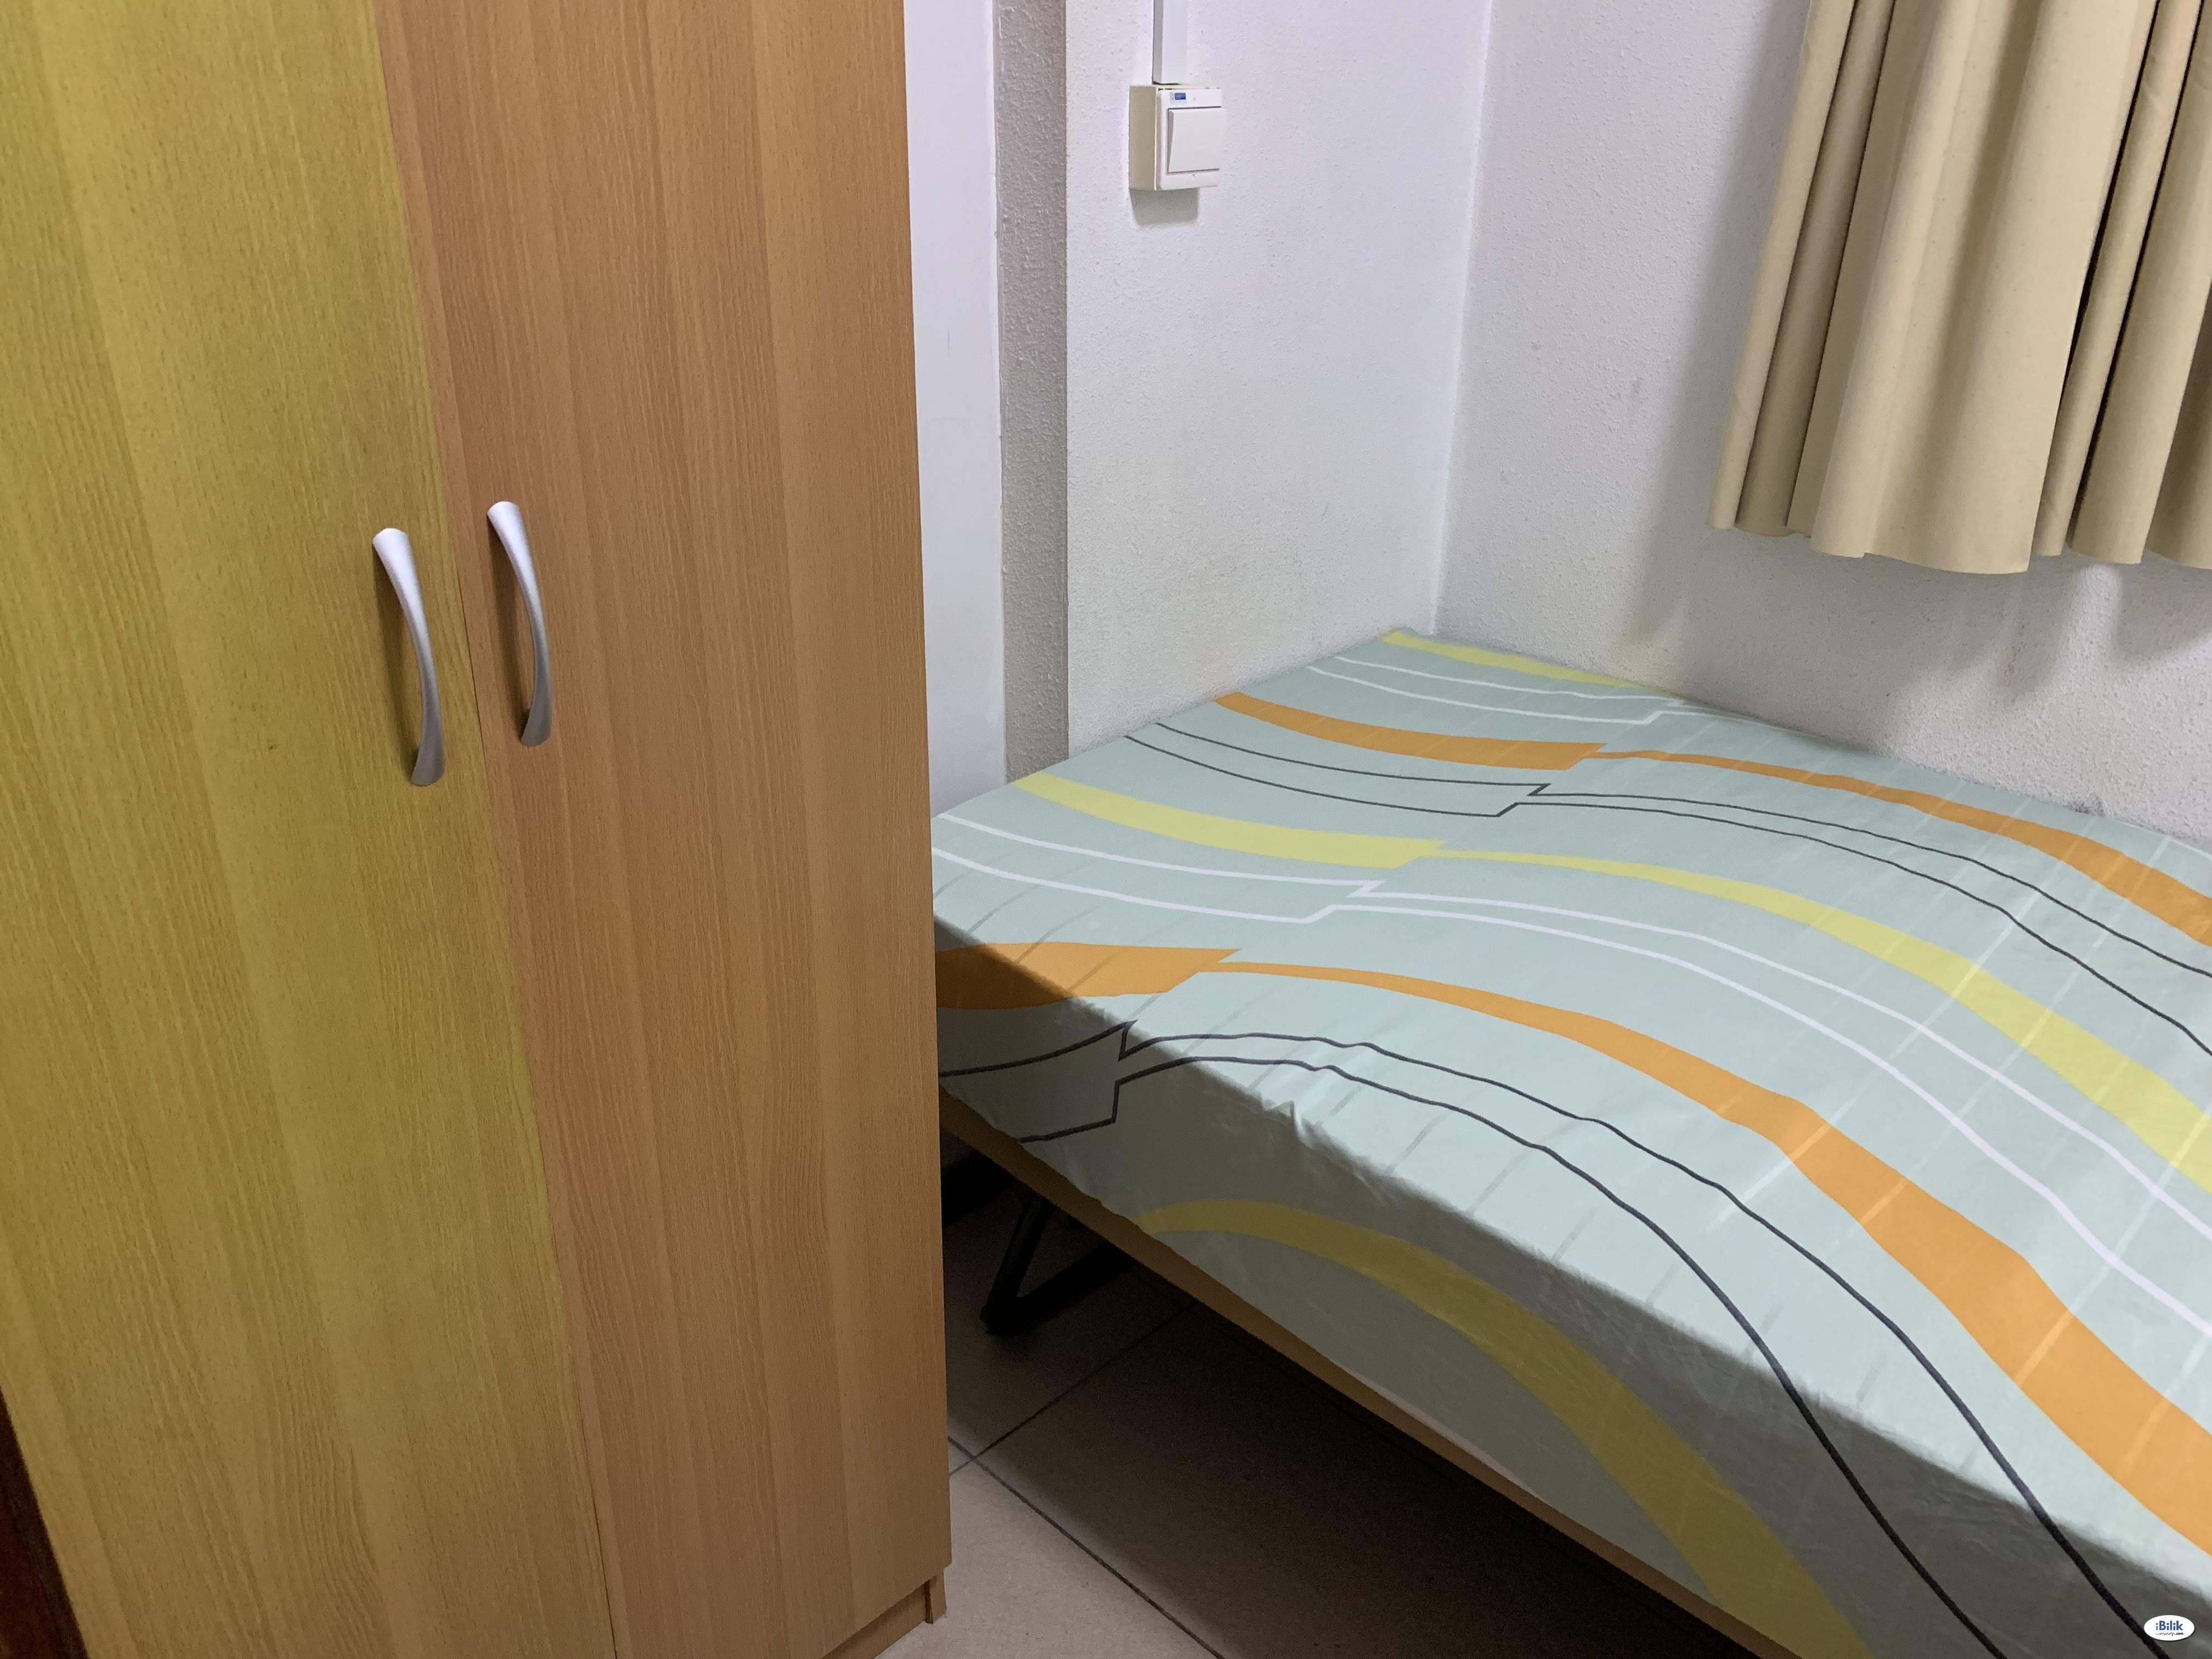 Suite @ Payalebar Near Serangoon Mrt, Can Cook, Allowed Visitors